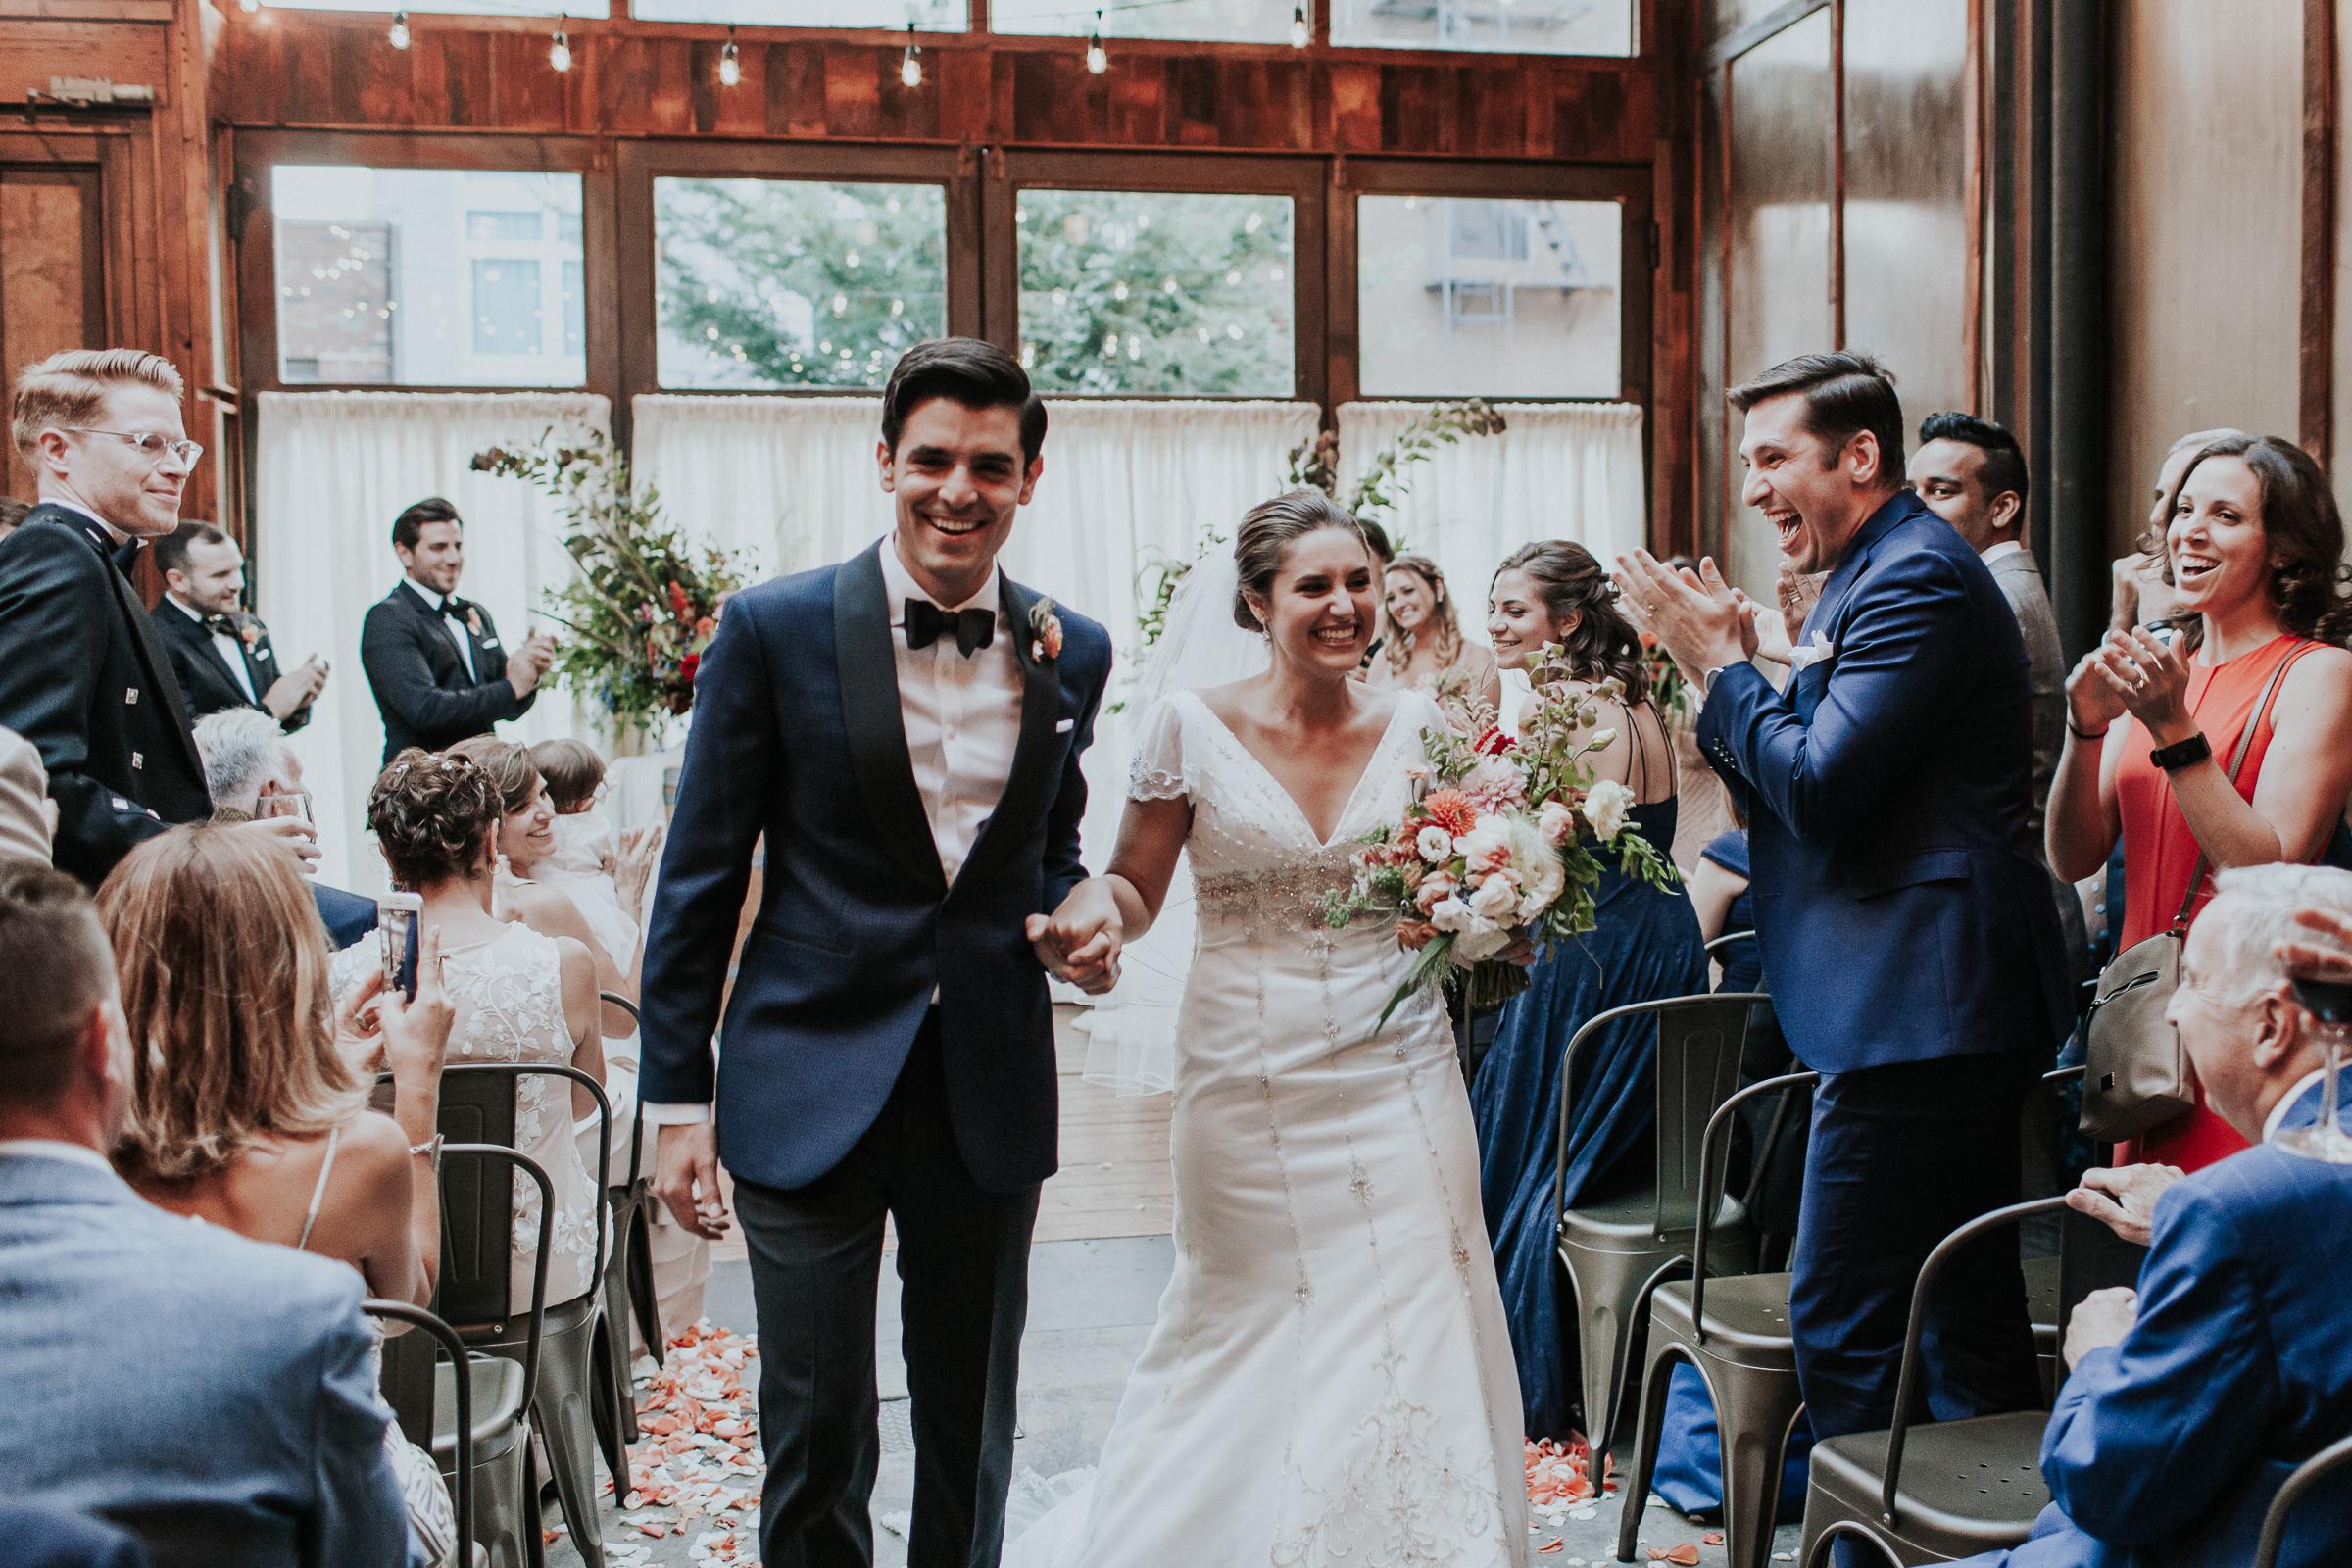 Brooklyn-Winery-NYC-Editorial-Documentary-Wedding-Photographer-Gina-Oli-79.jpg